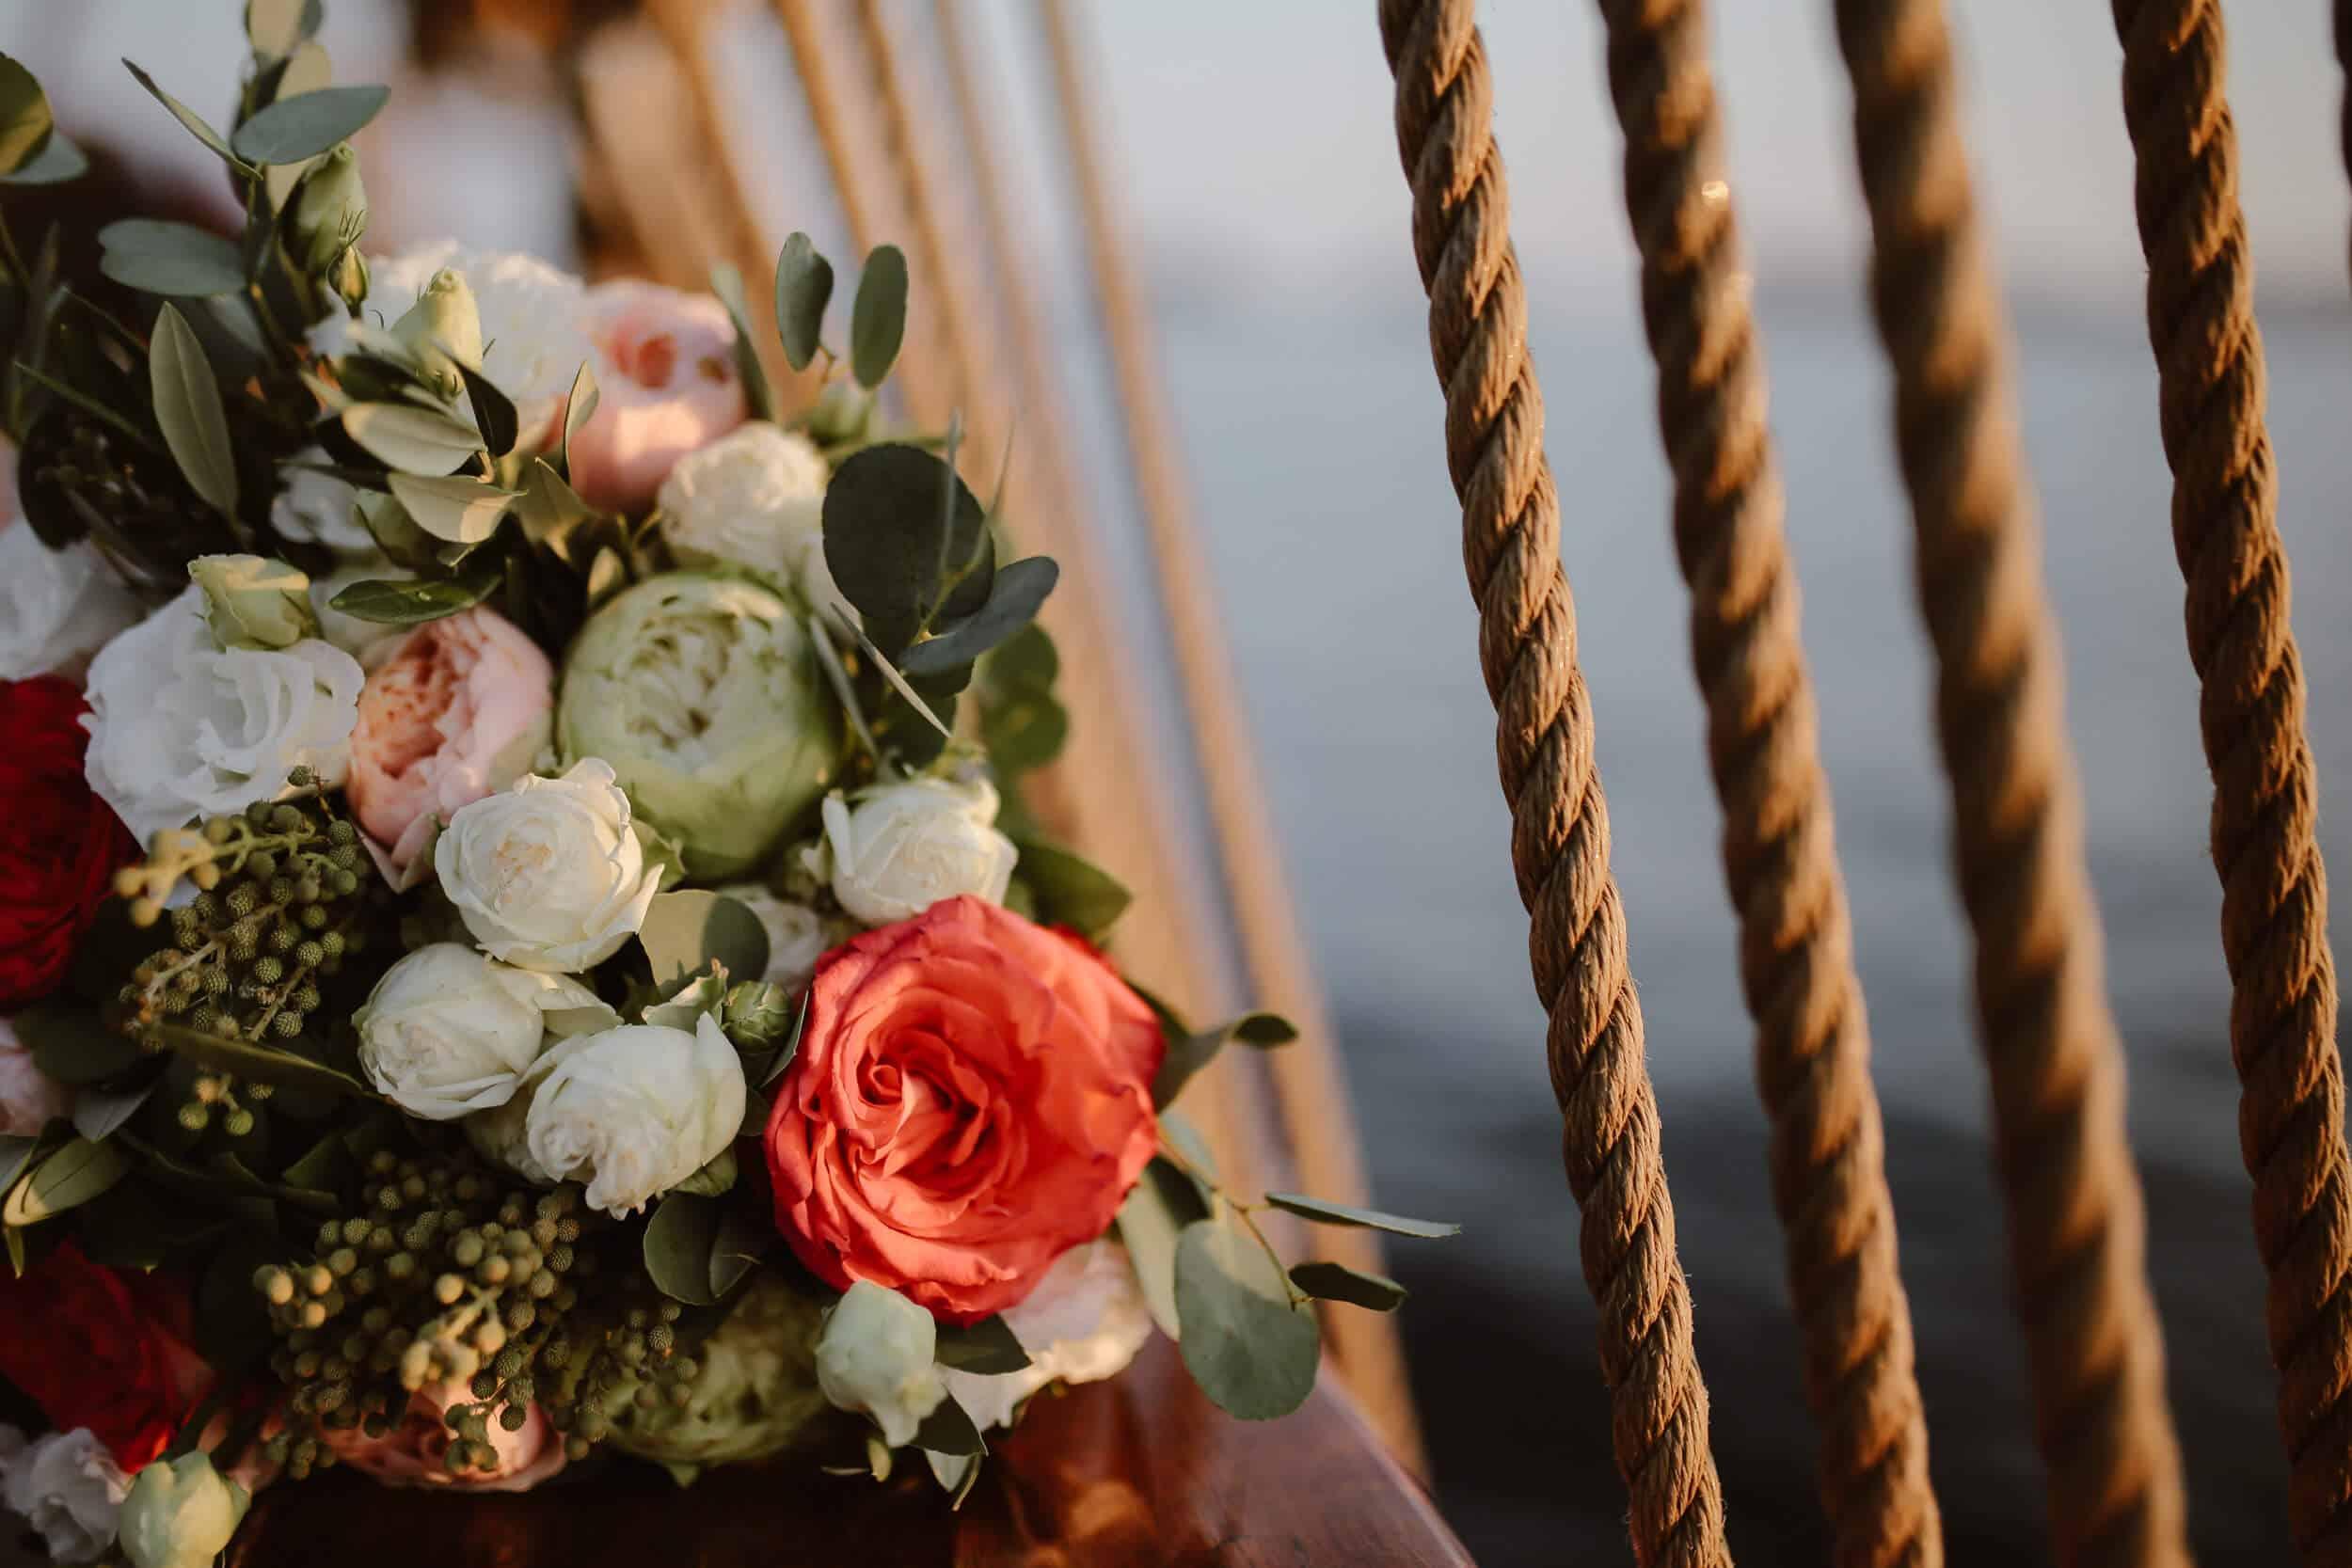 Dubrovnik karaka boat elopement matea stephan 11 | Croatia Elopement Photographer and Videographer